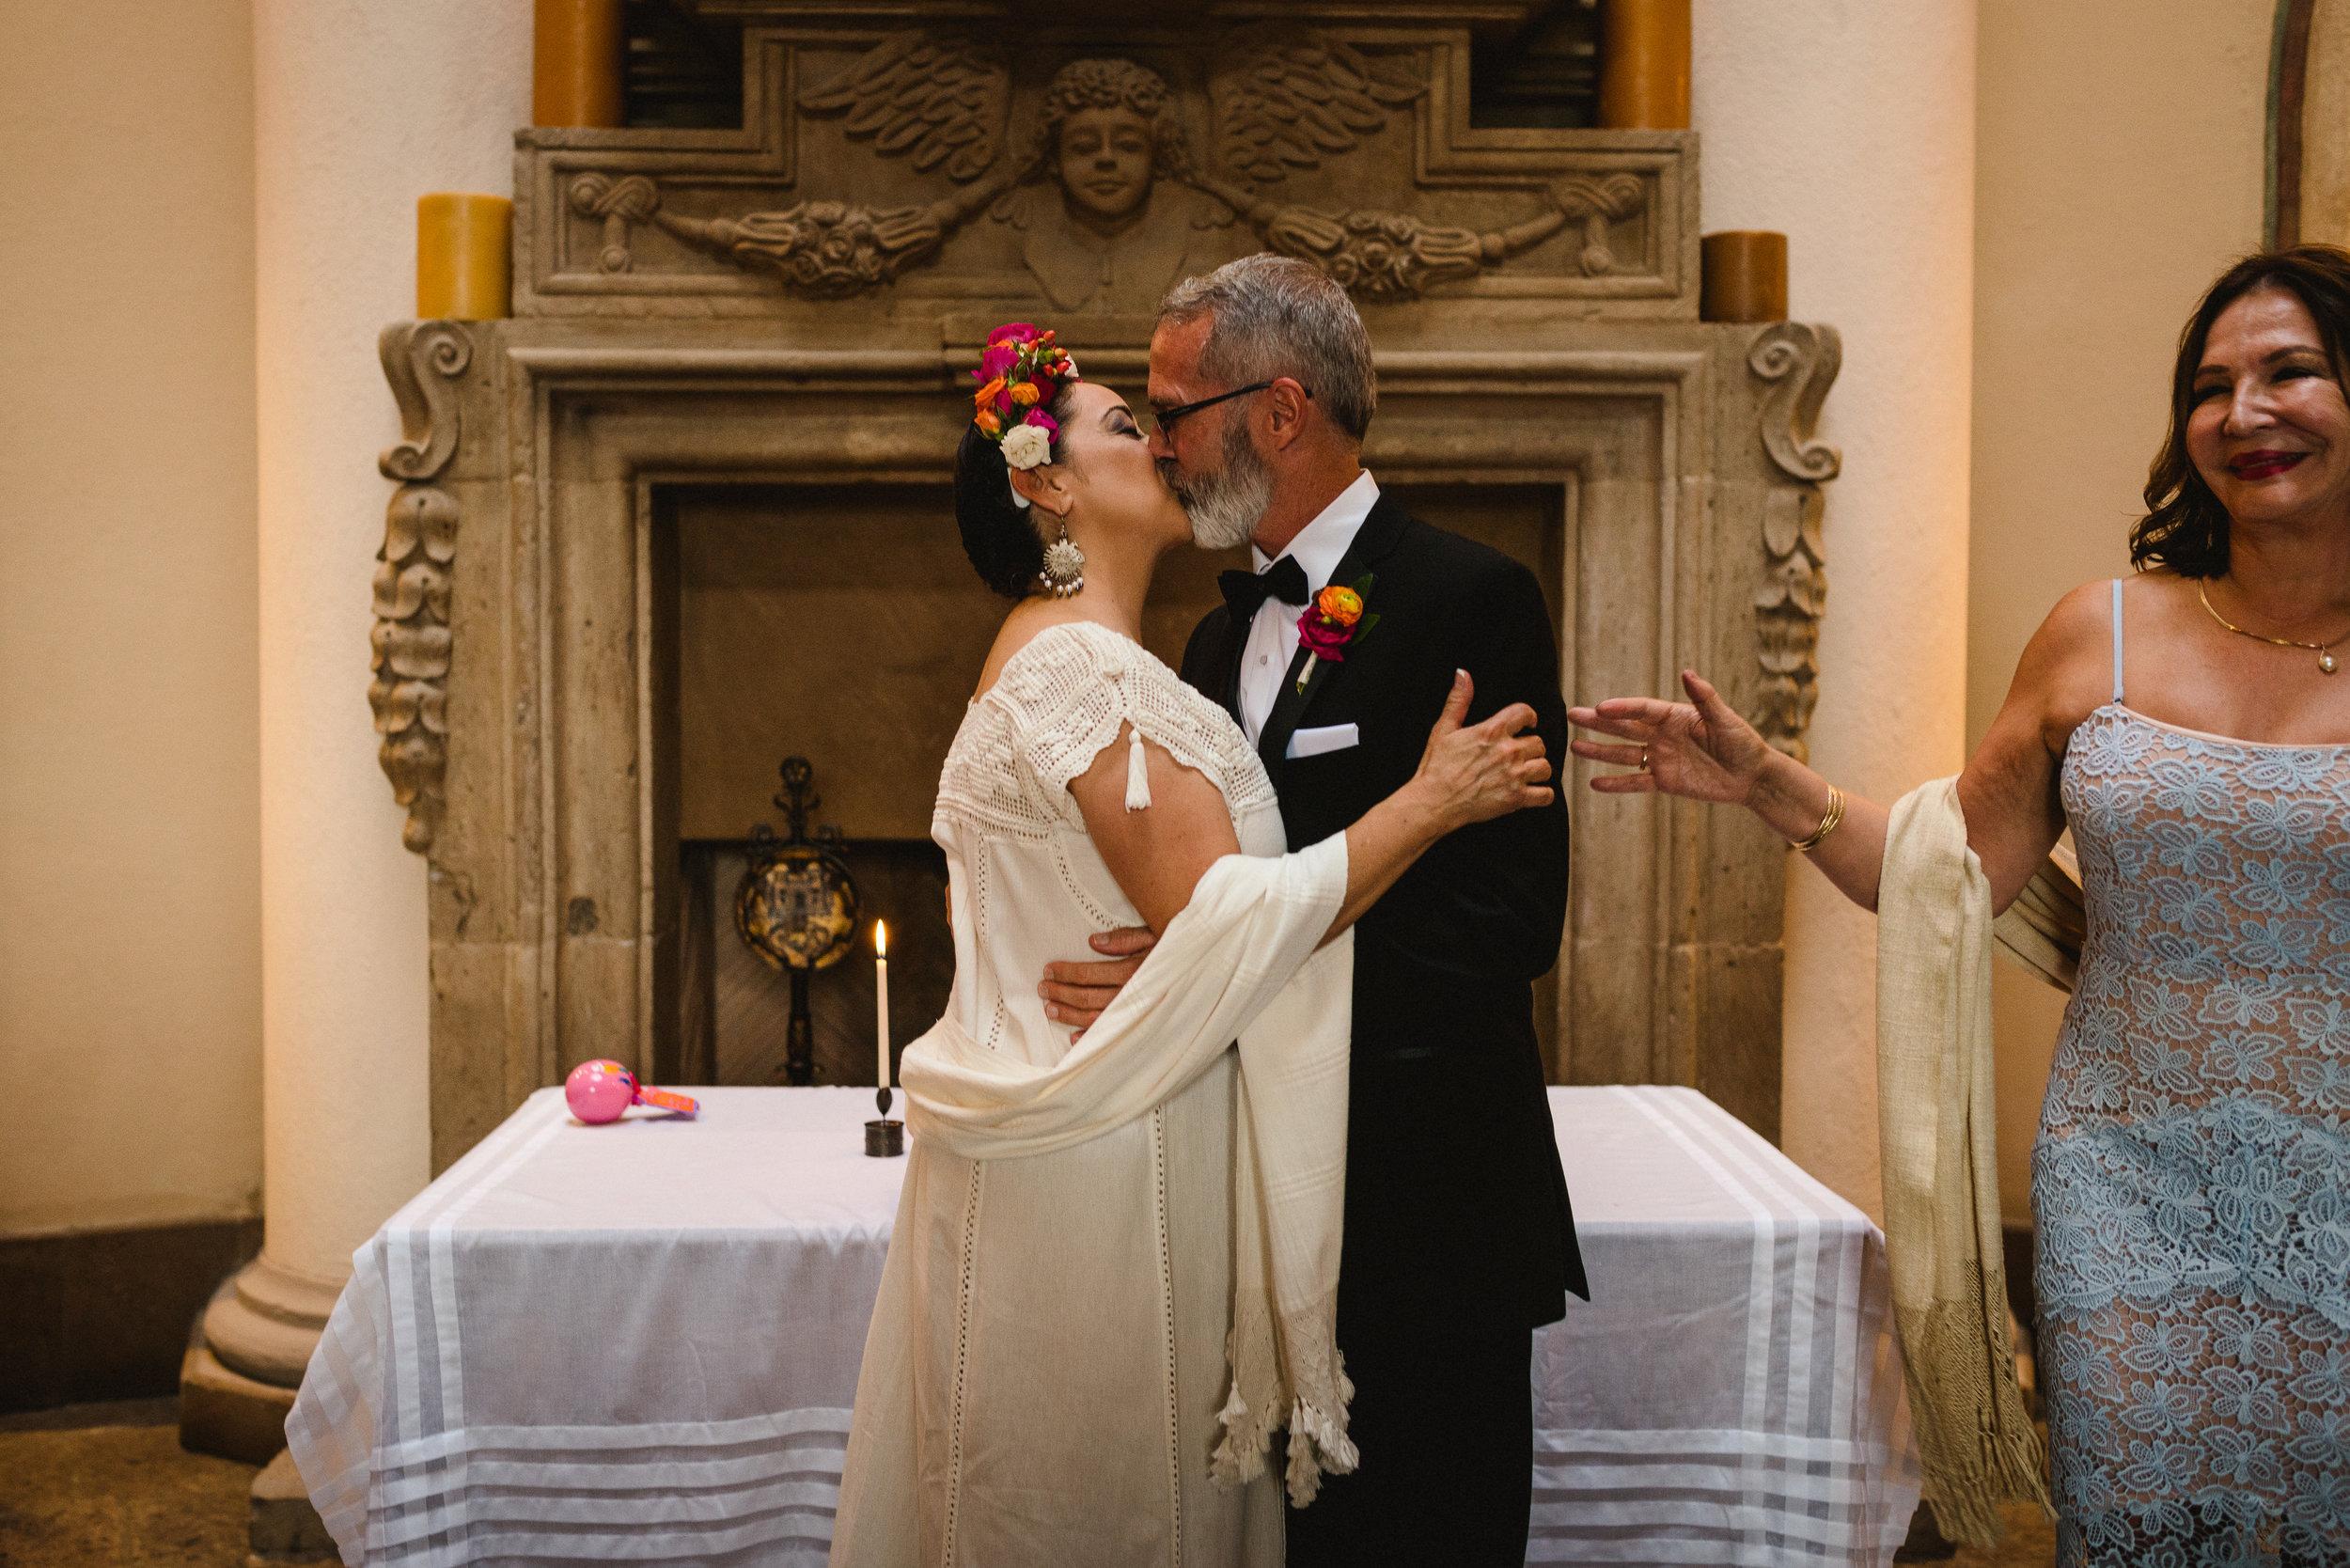 MaurizioSolisBroca-casa-carino-san-miguel-de-allende-wedding-63.jpg